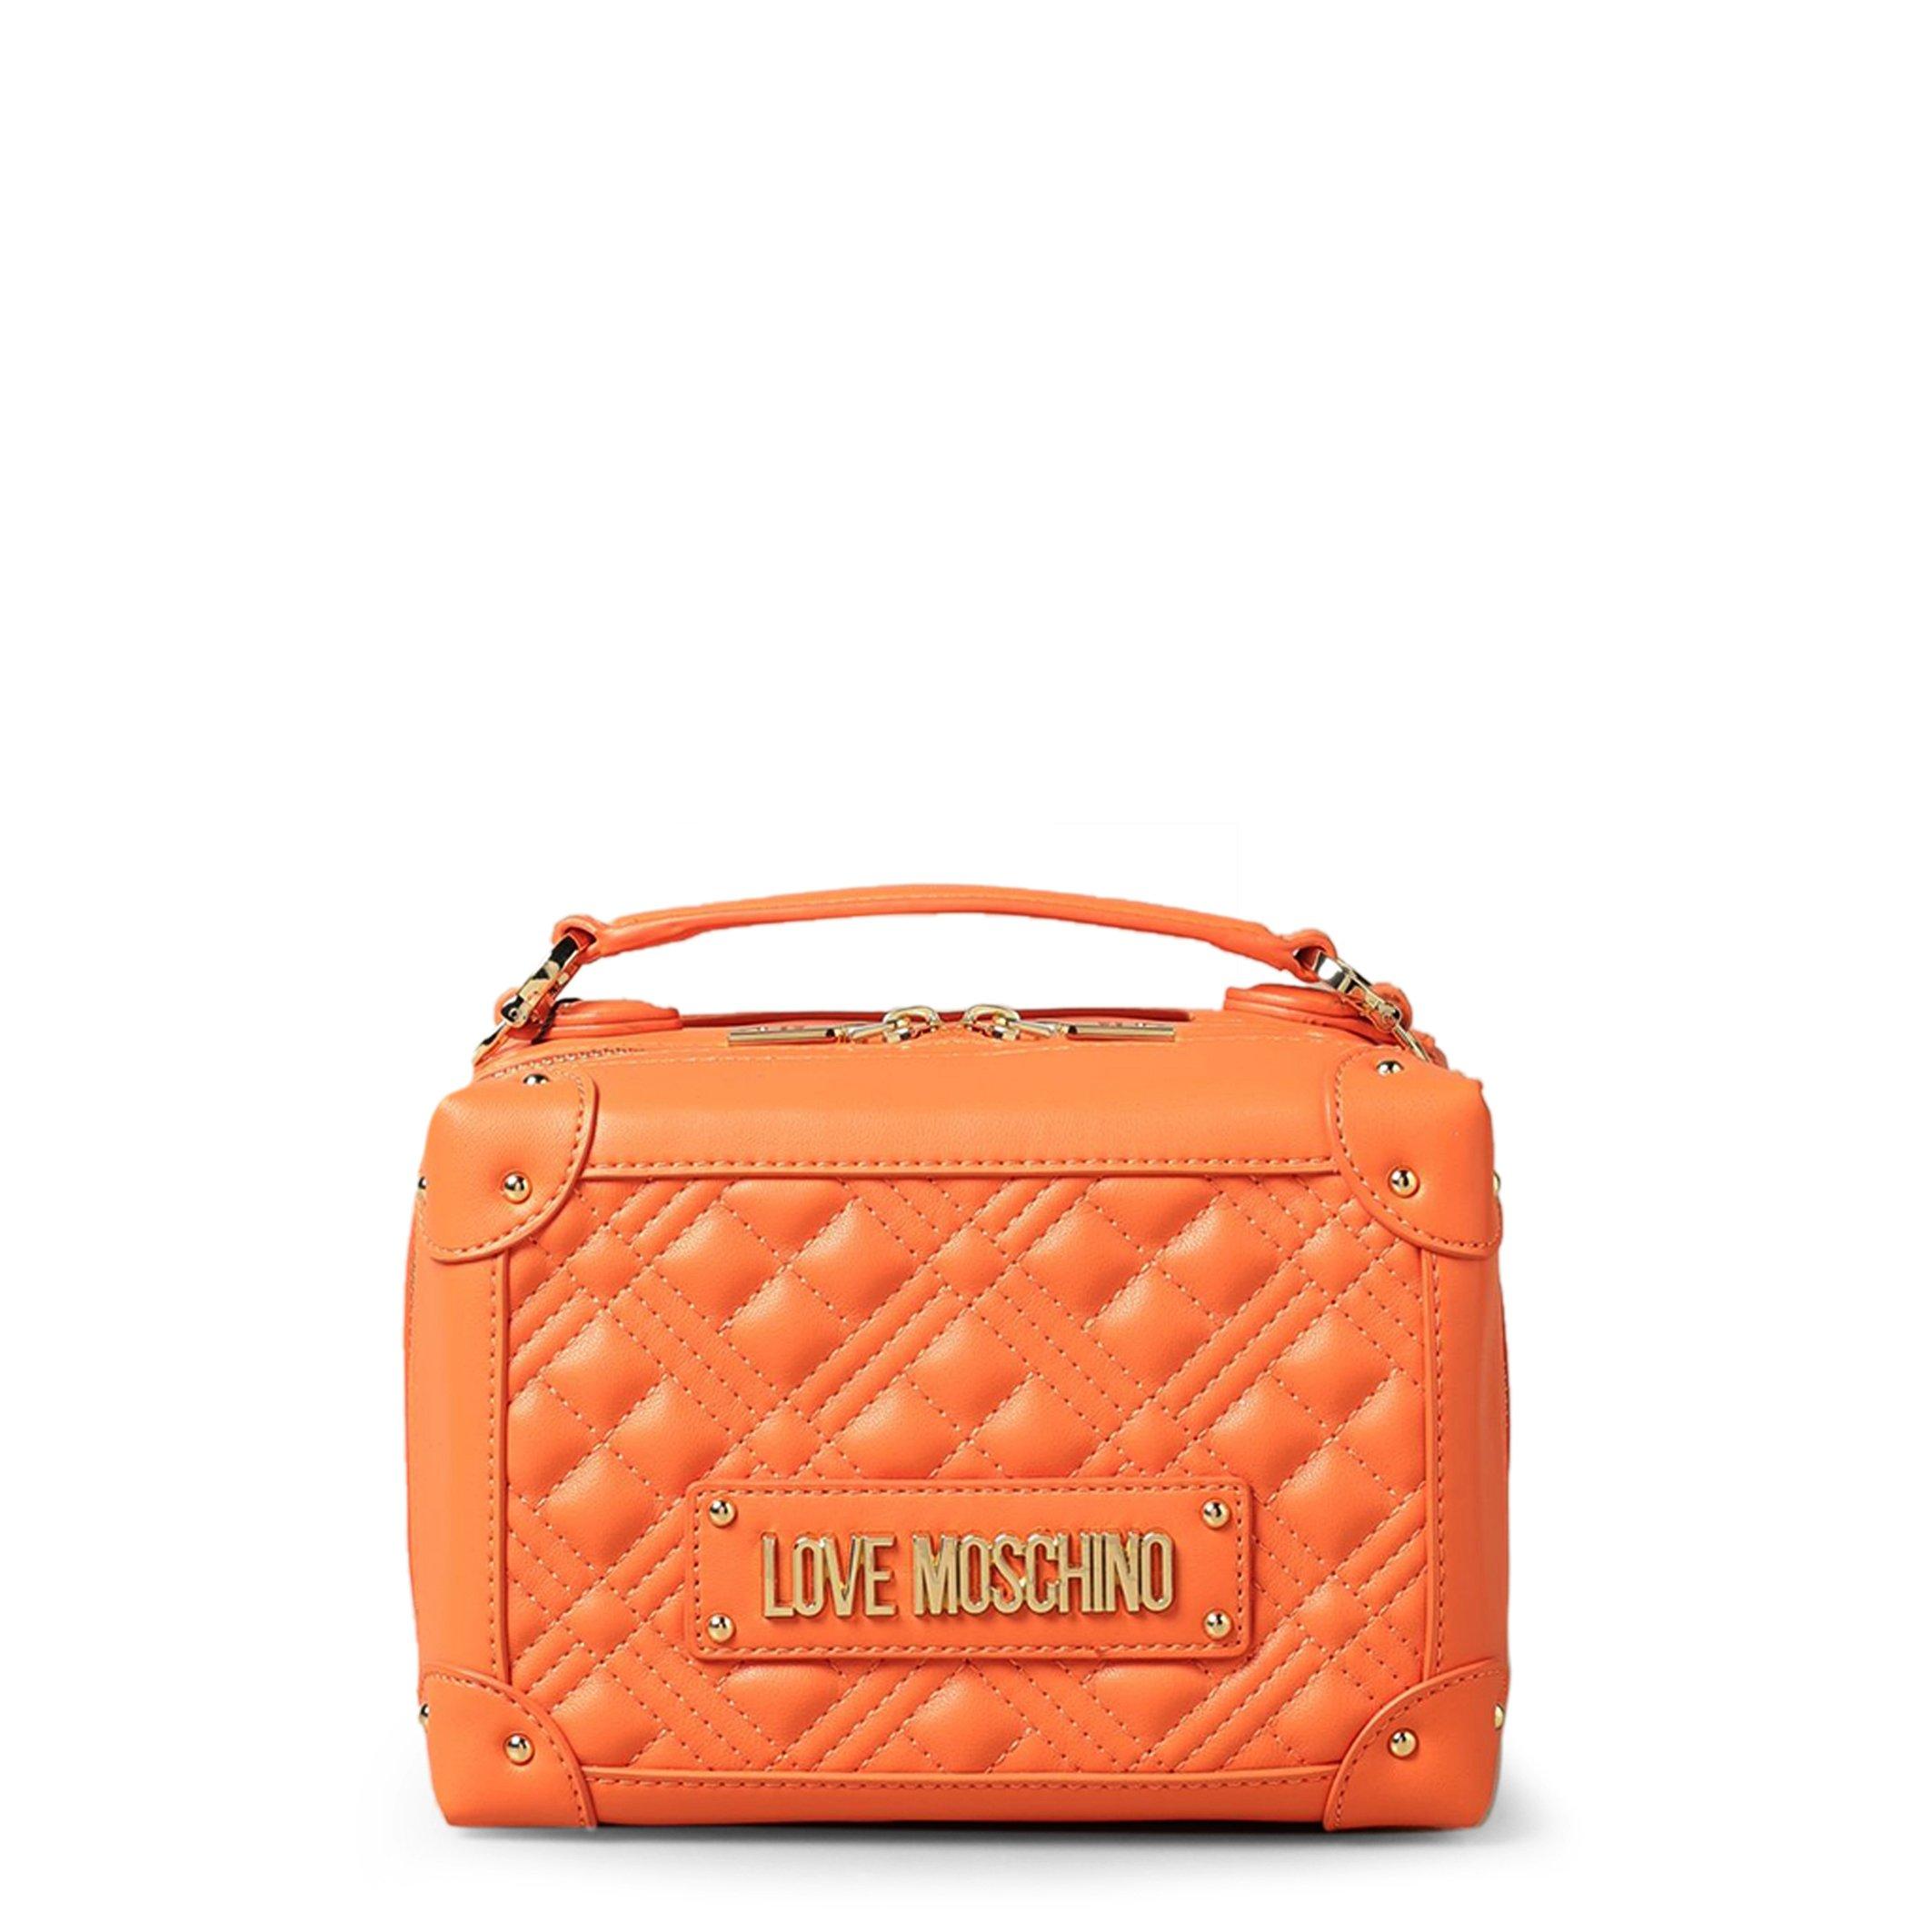 Love Moschino Women's Handbag Various Colours JC4204PP0CKA0 - orange NOSIZE